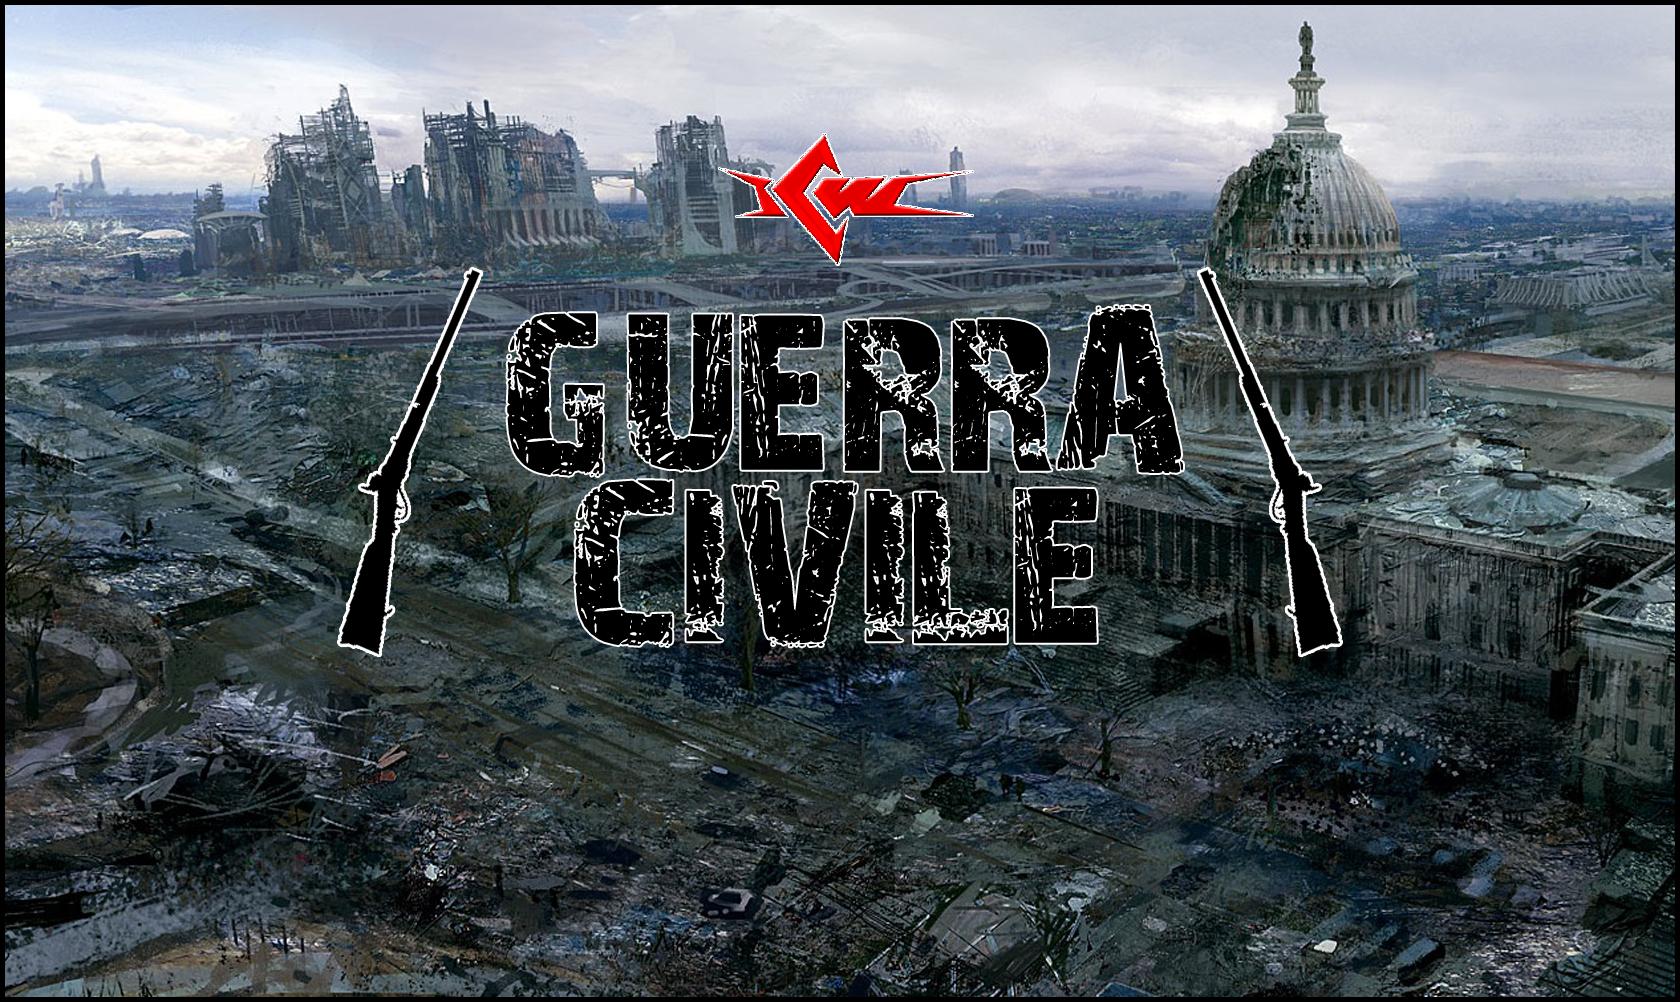 logo Guerra Civile 2013 - scritta nera